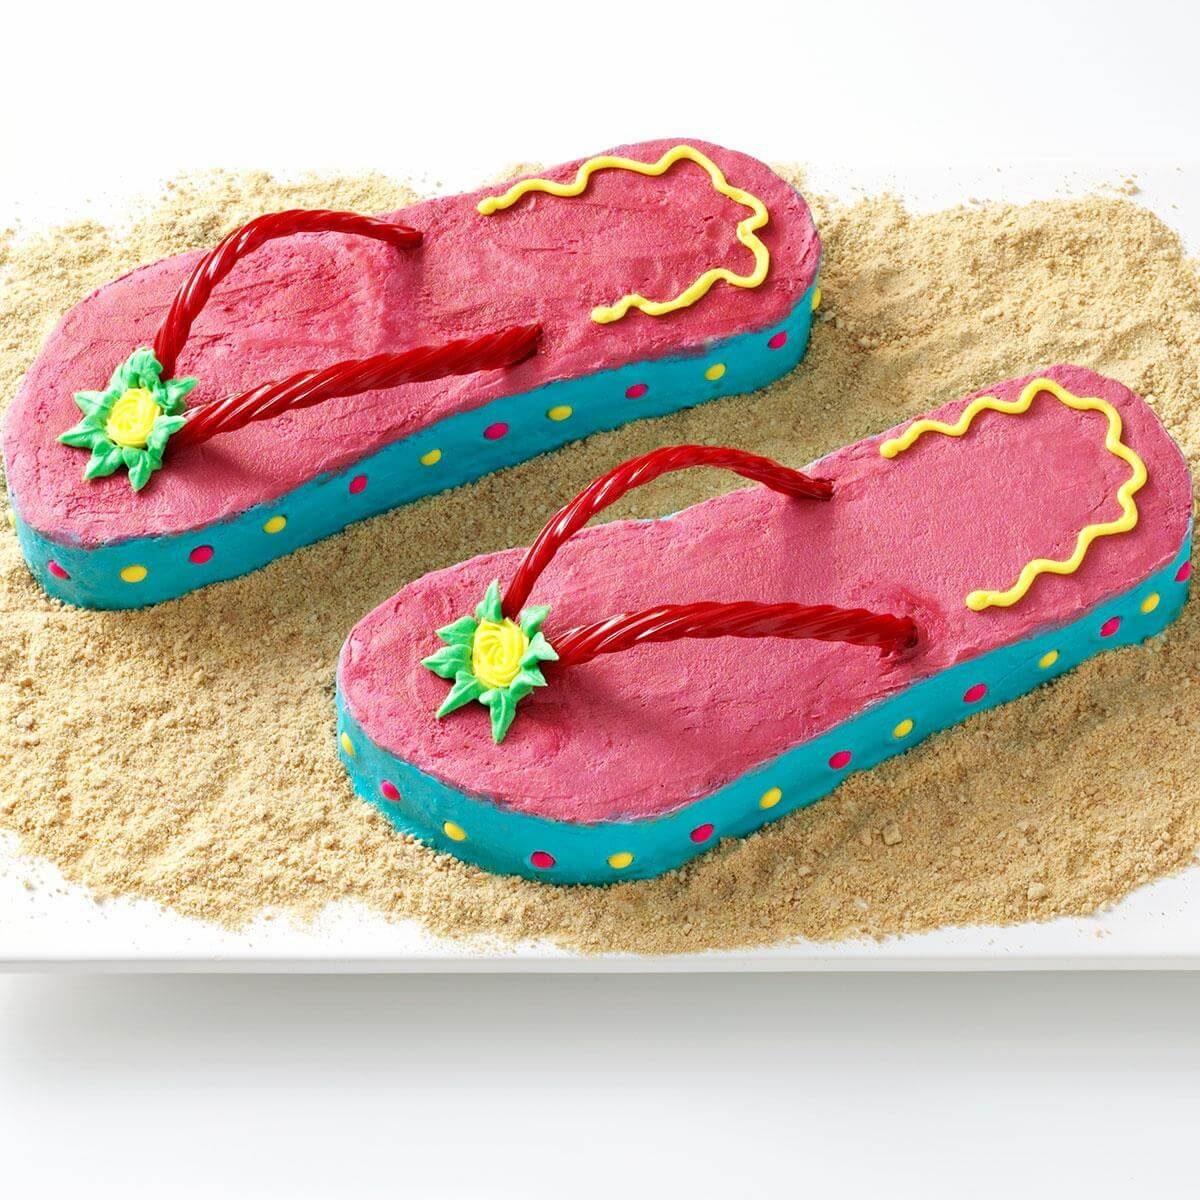 Flip Flop Cake Recipe